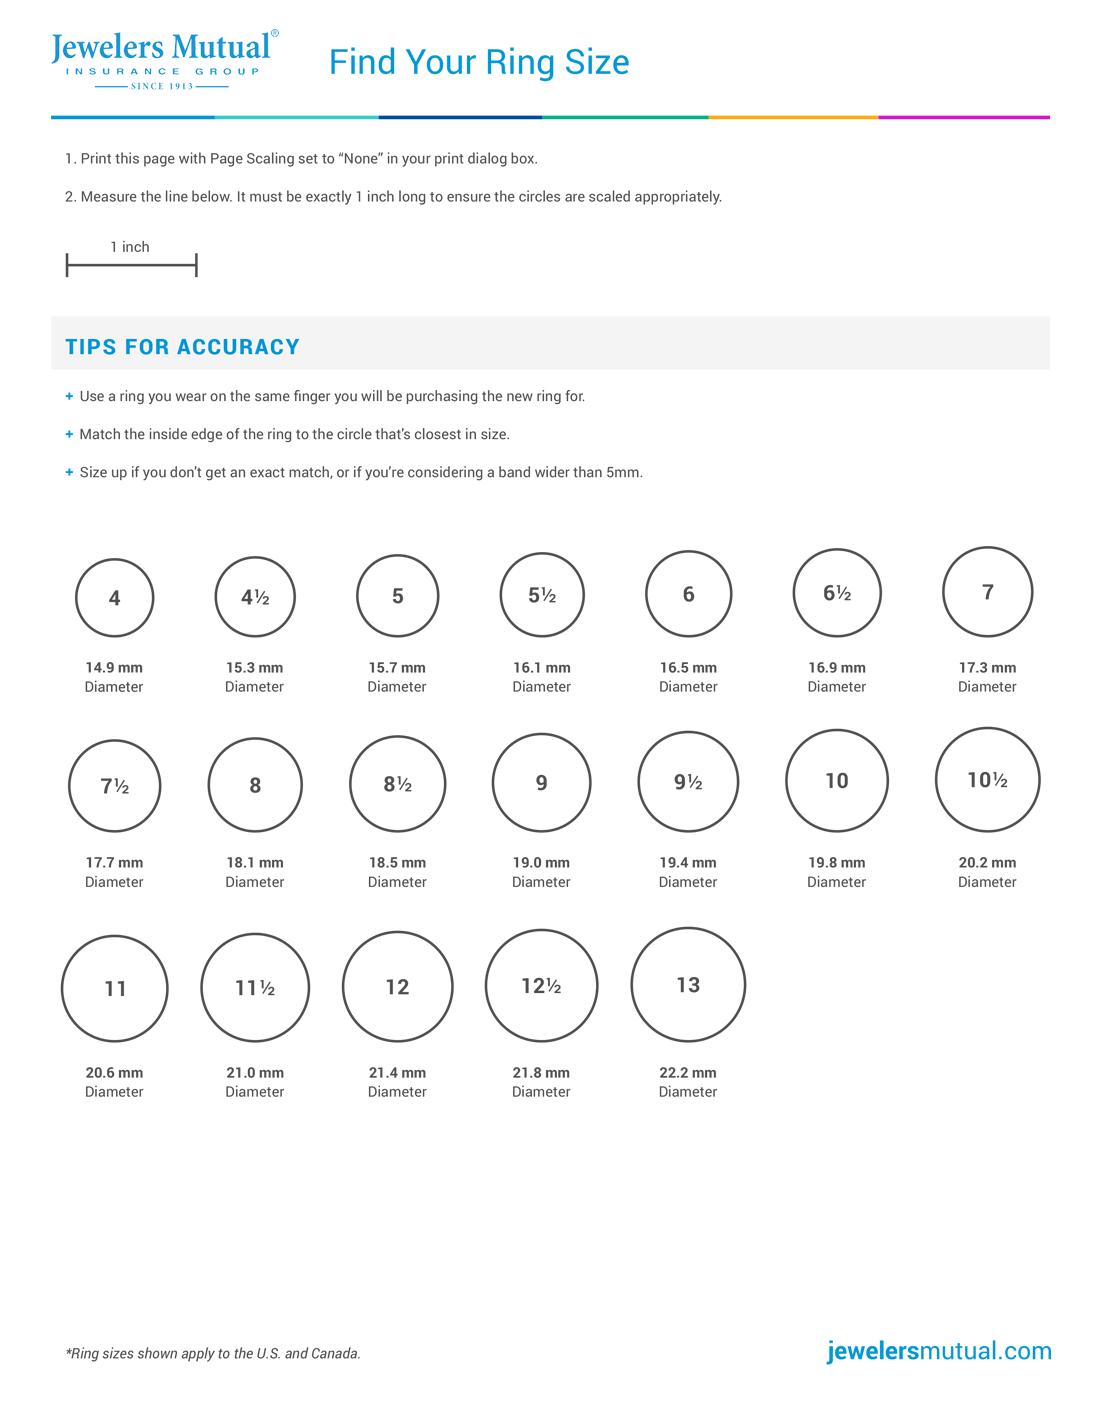 Diamond Size Chart & 4 More Tools You Shouldn't Shop